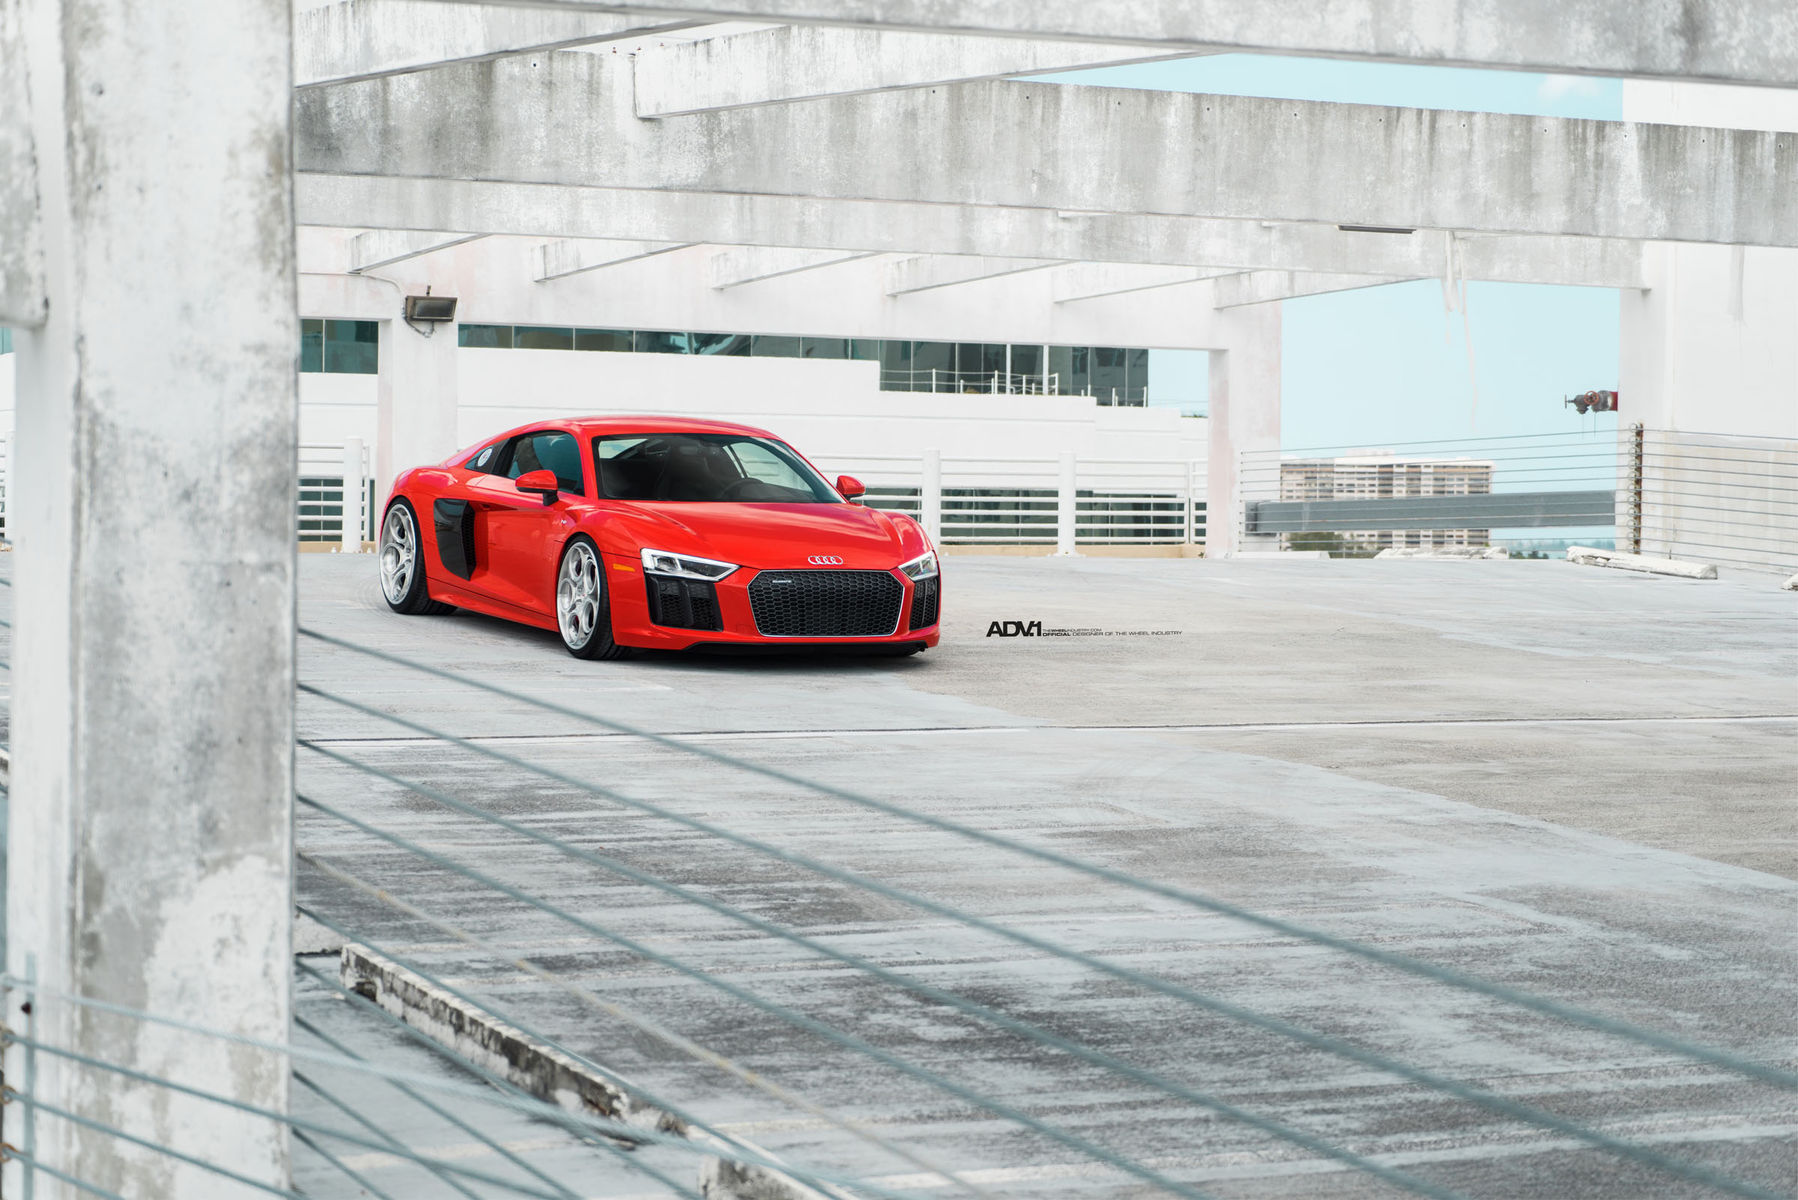 2017 Audi R8 | ADV.1 2017 Audi R8